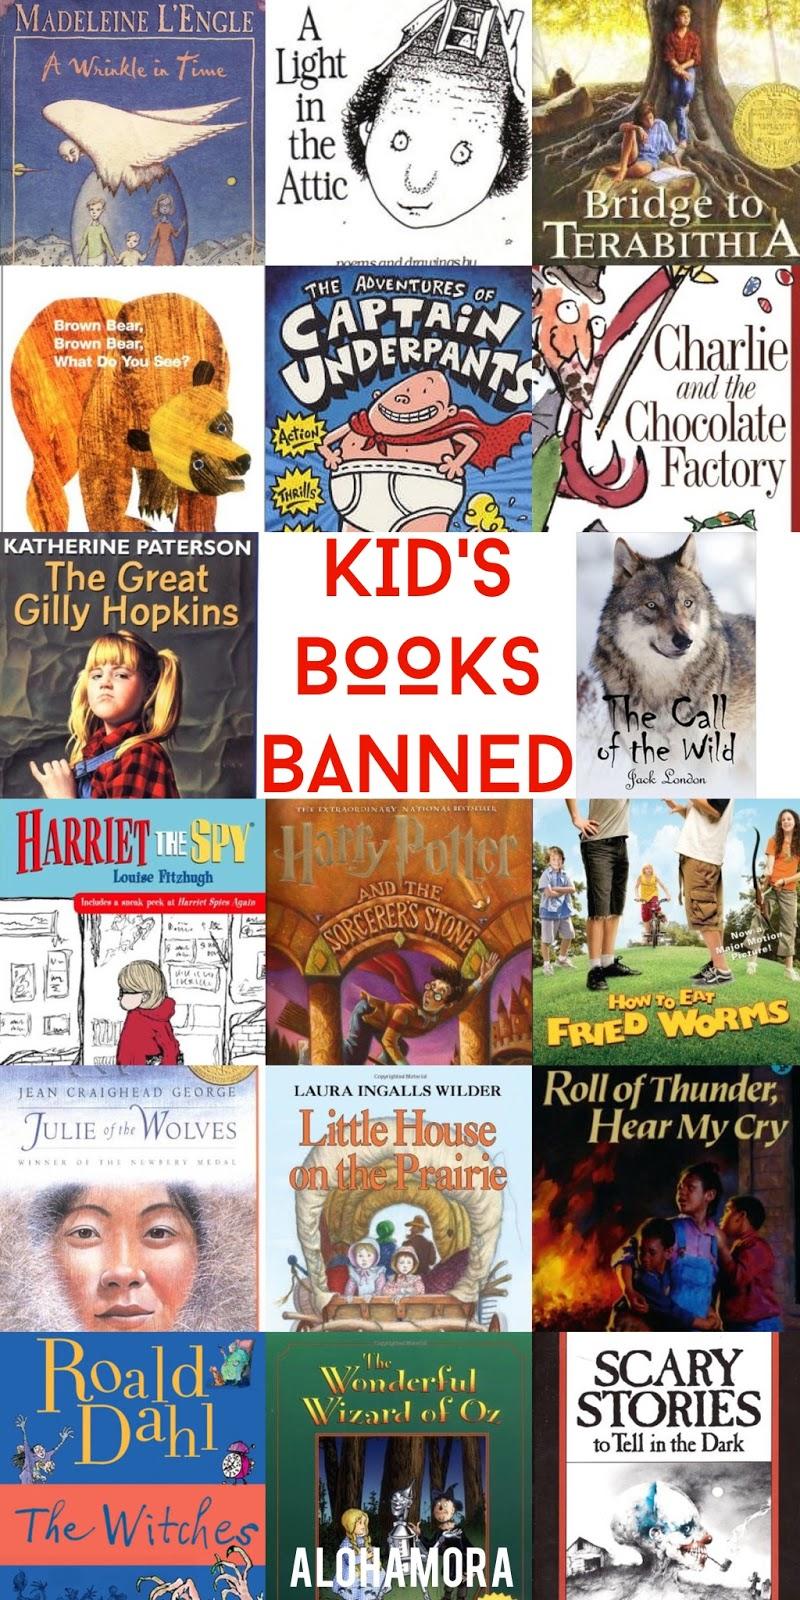 Alohamora: Open a Book: Even Children's Books are Banned ...